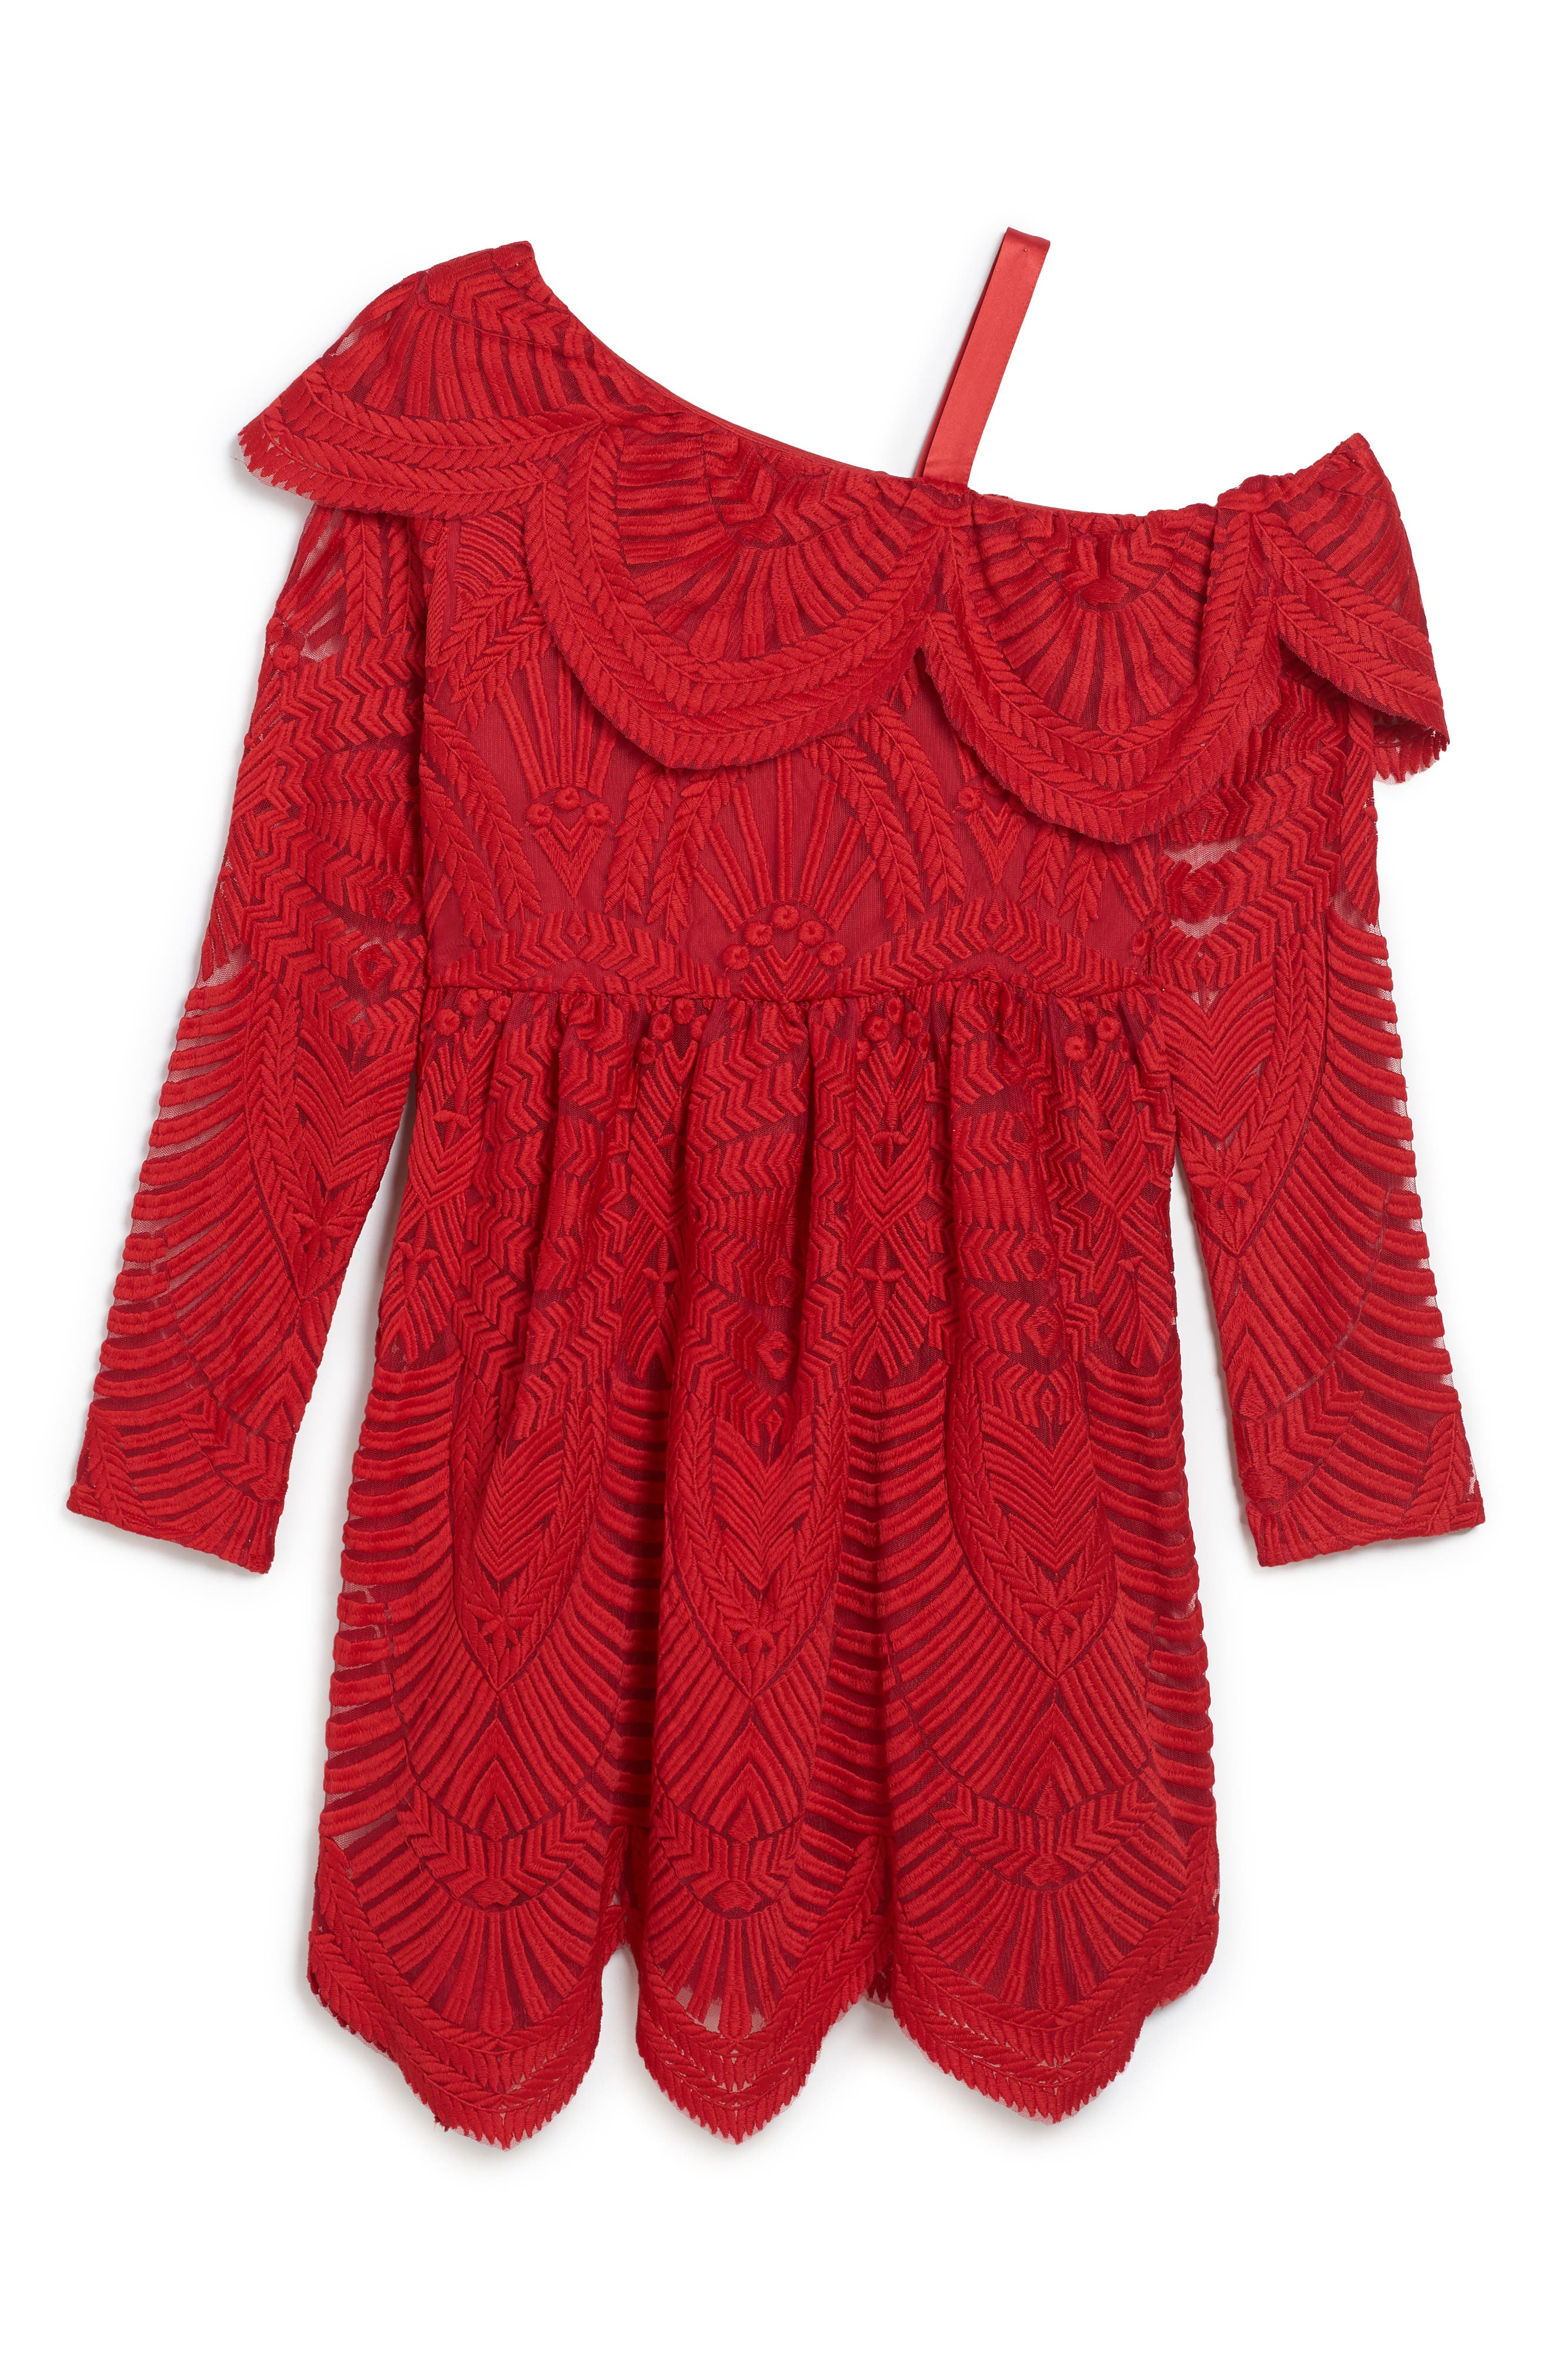 Main Image - Bardot Junior Sybil Lace Dress (Toddler Girls, Little Girls & Big Girls)